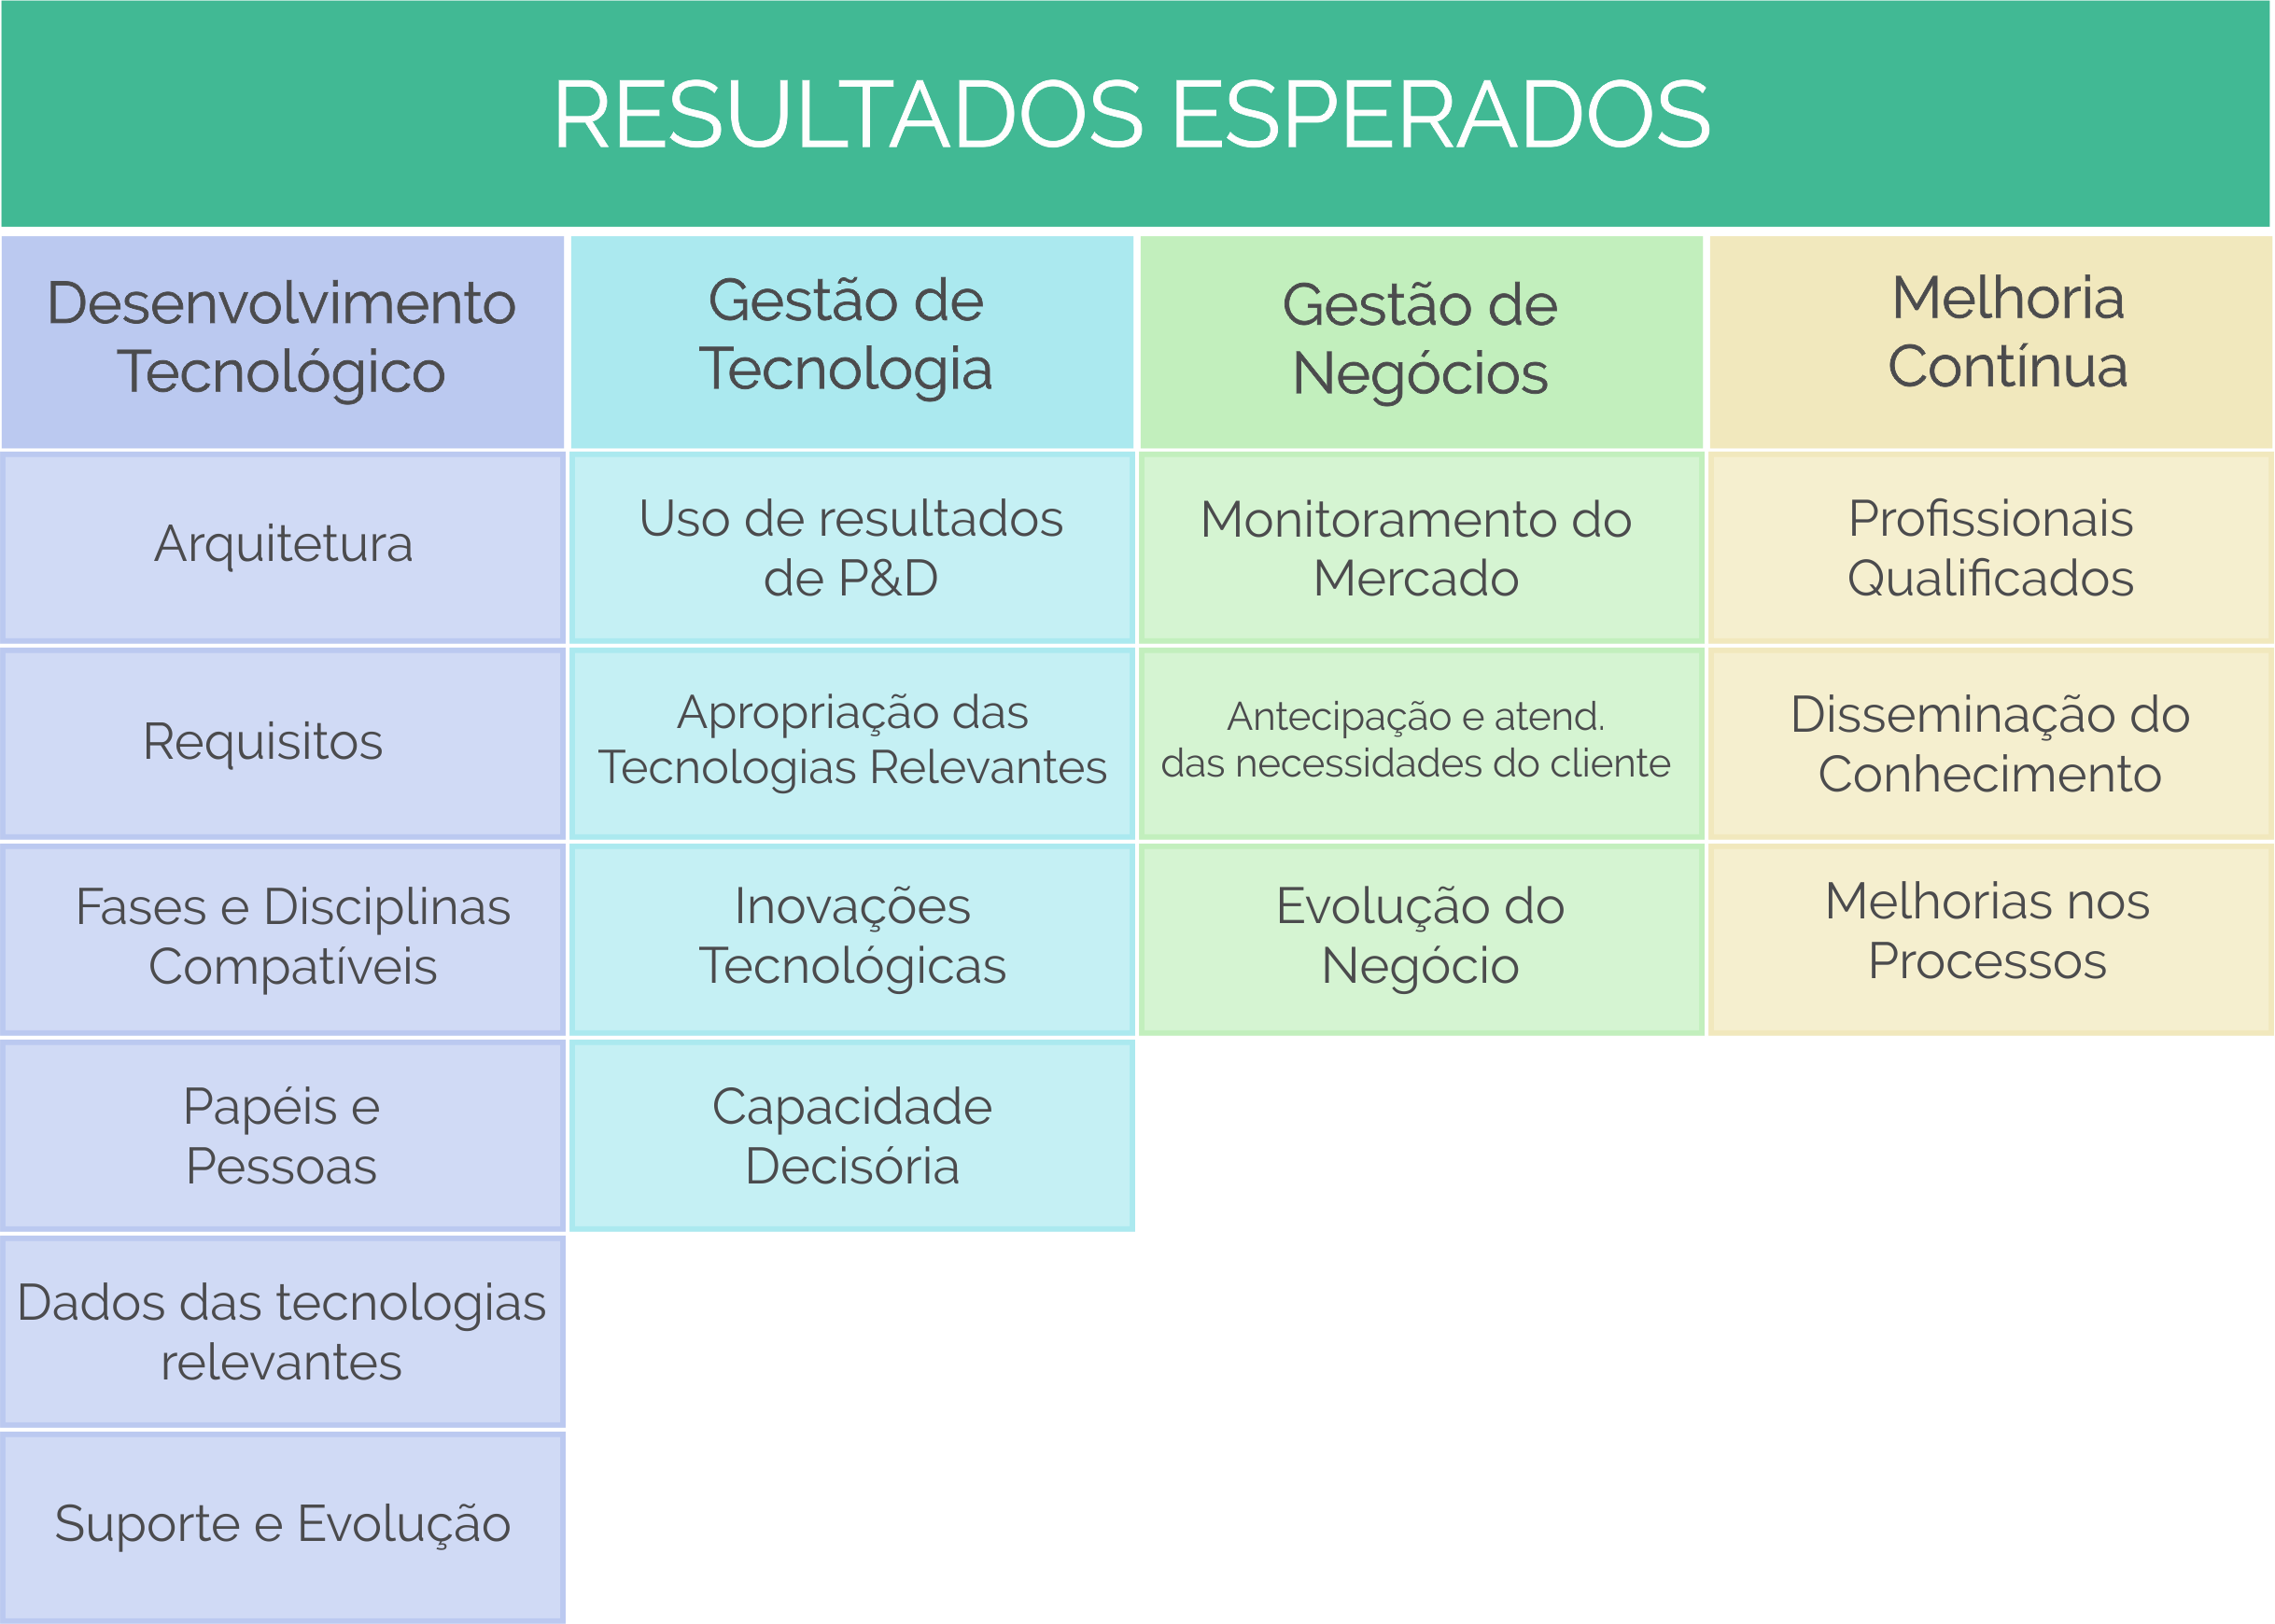 RESULTADOS ESPERADOS CERTICS